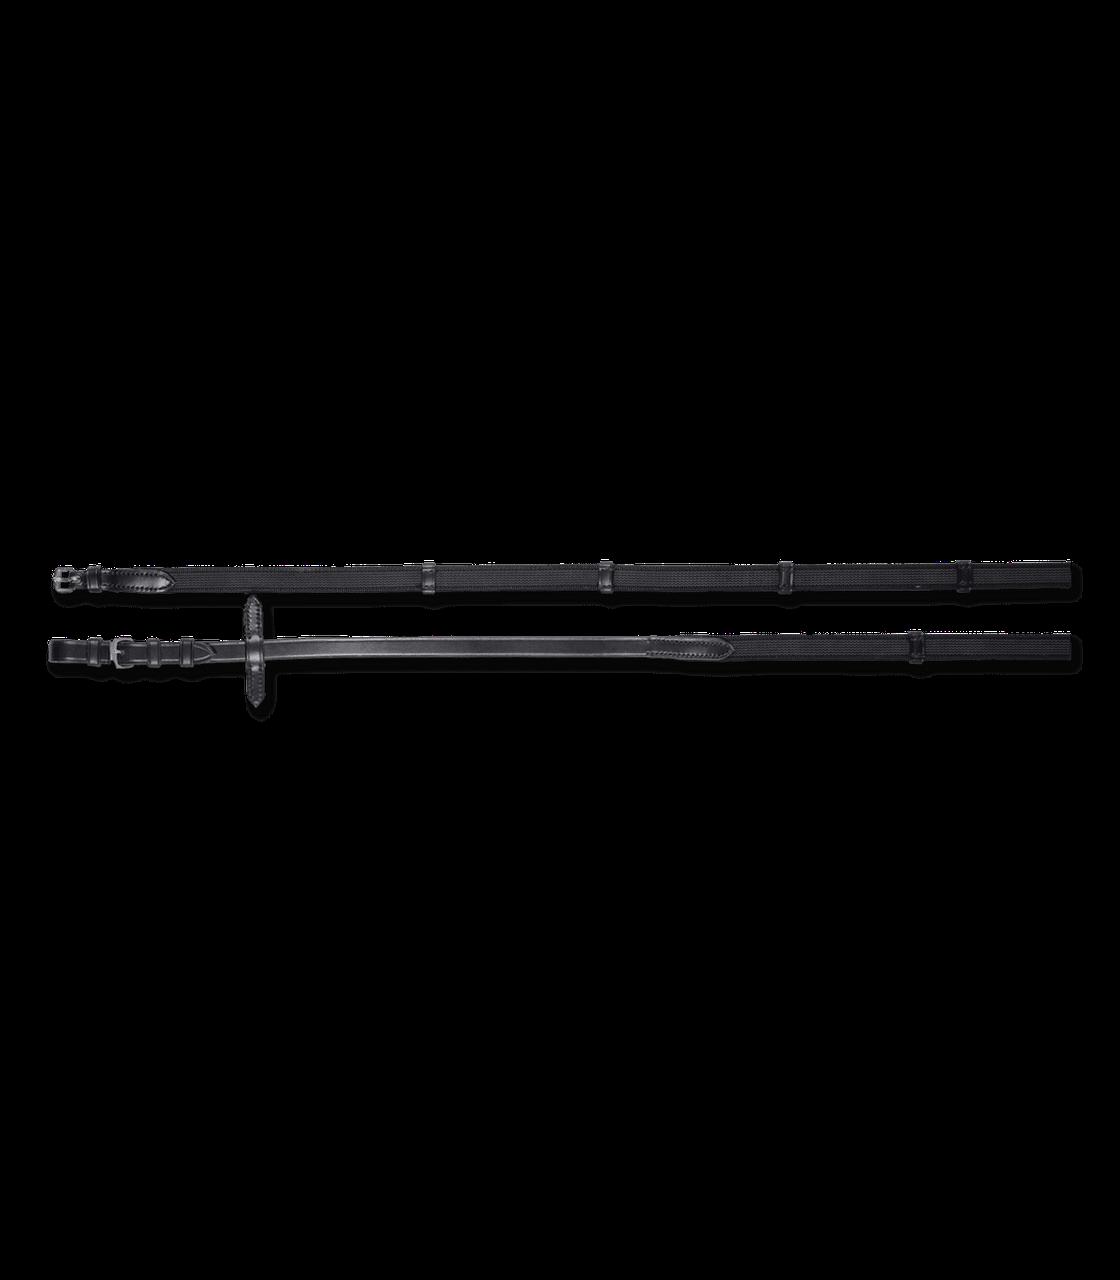 braun Waldhausen Kandarenz/ügel Leder X-Line 12 mm braun